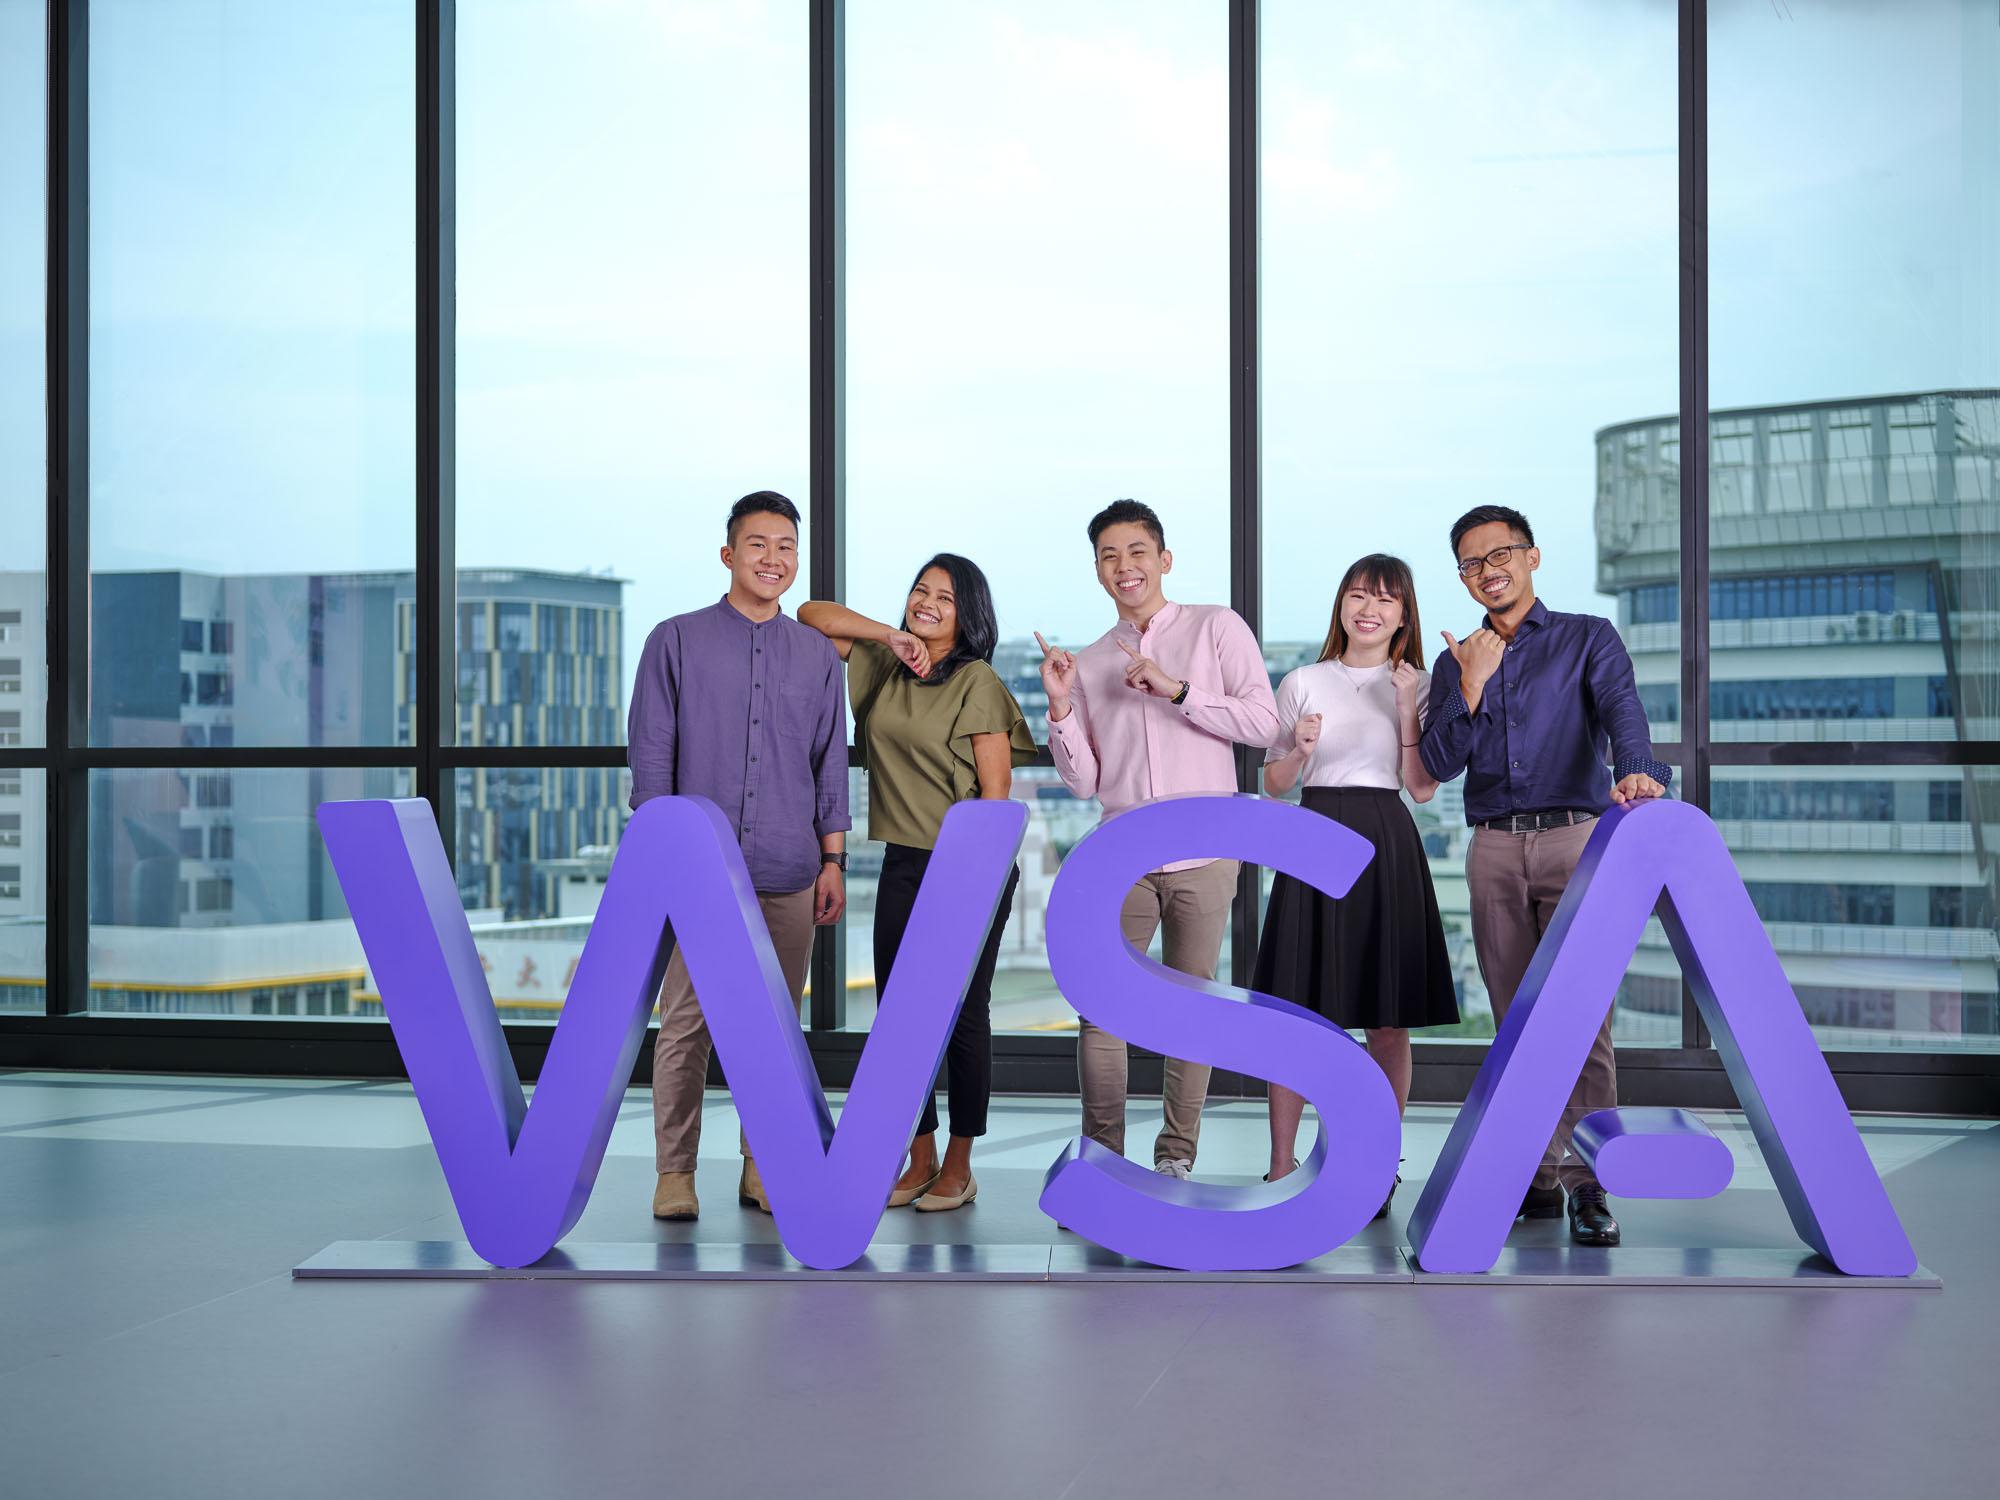 Commercial Photography Corporate Headshot Singapore Photographer COCO Creative Studio 38